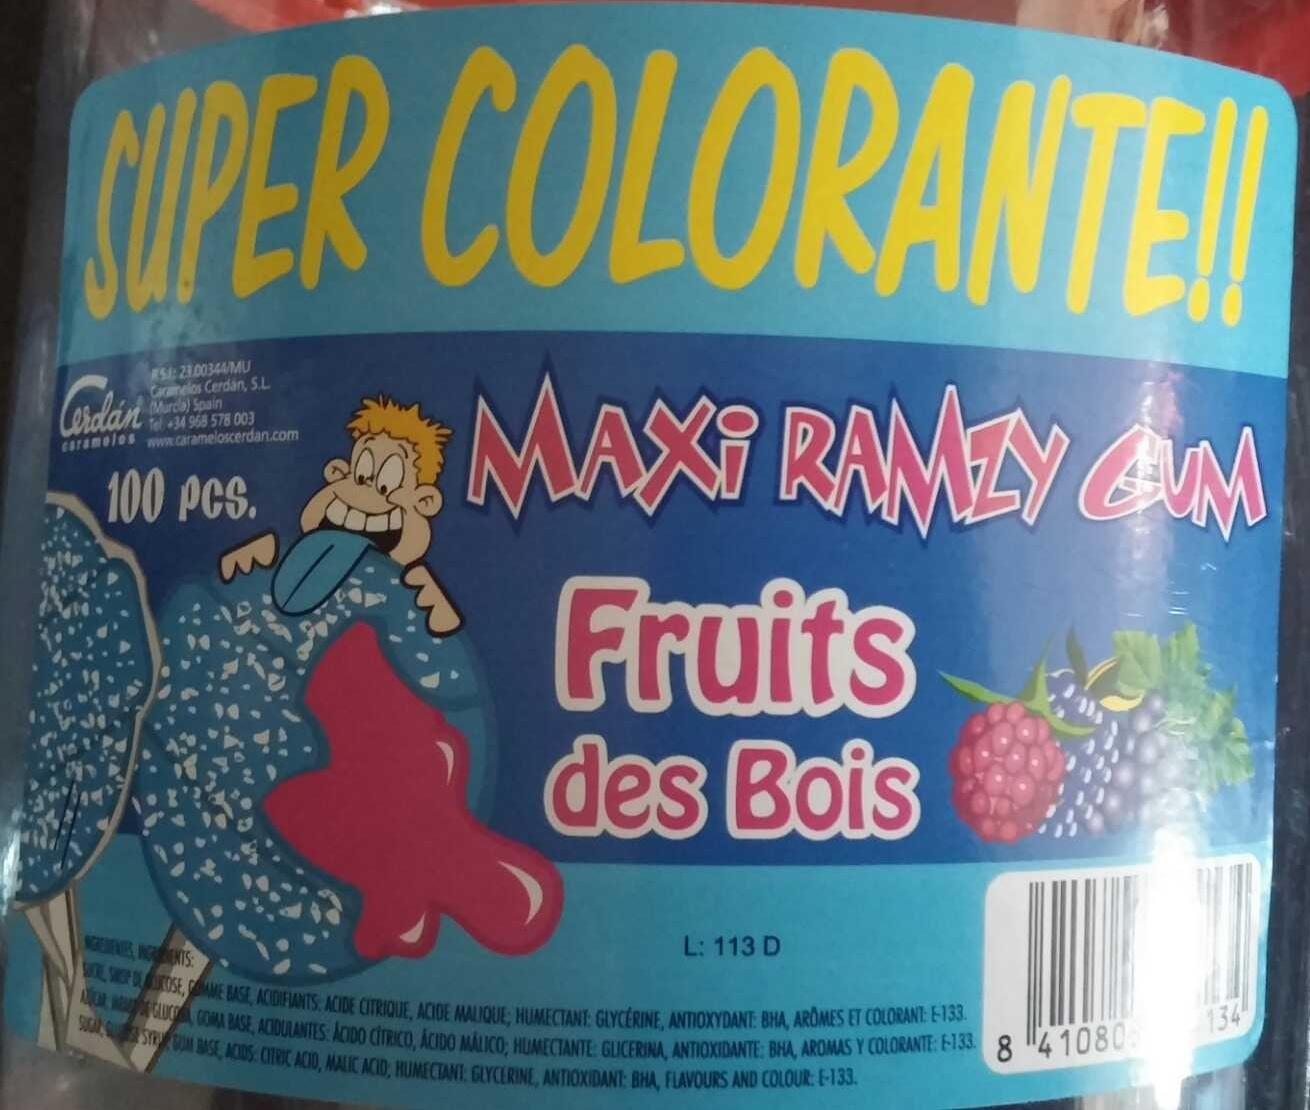 Maxi ramzy gym Fruits des bois - Product - fr